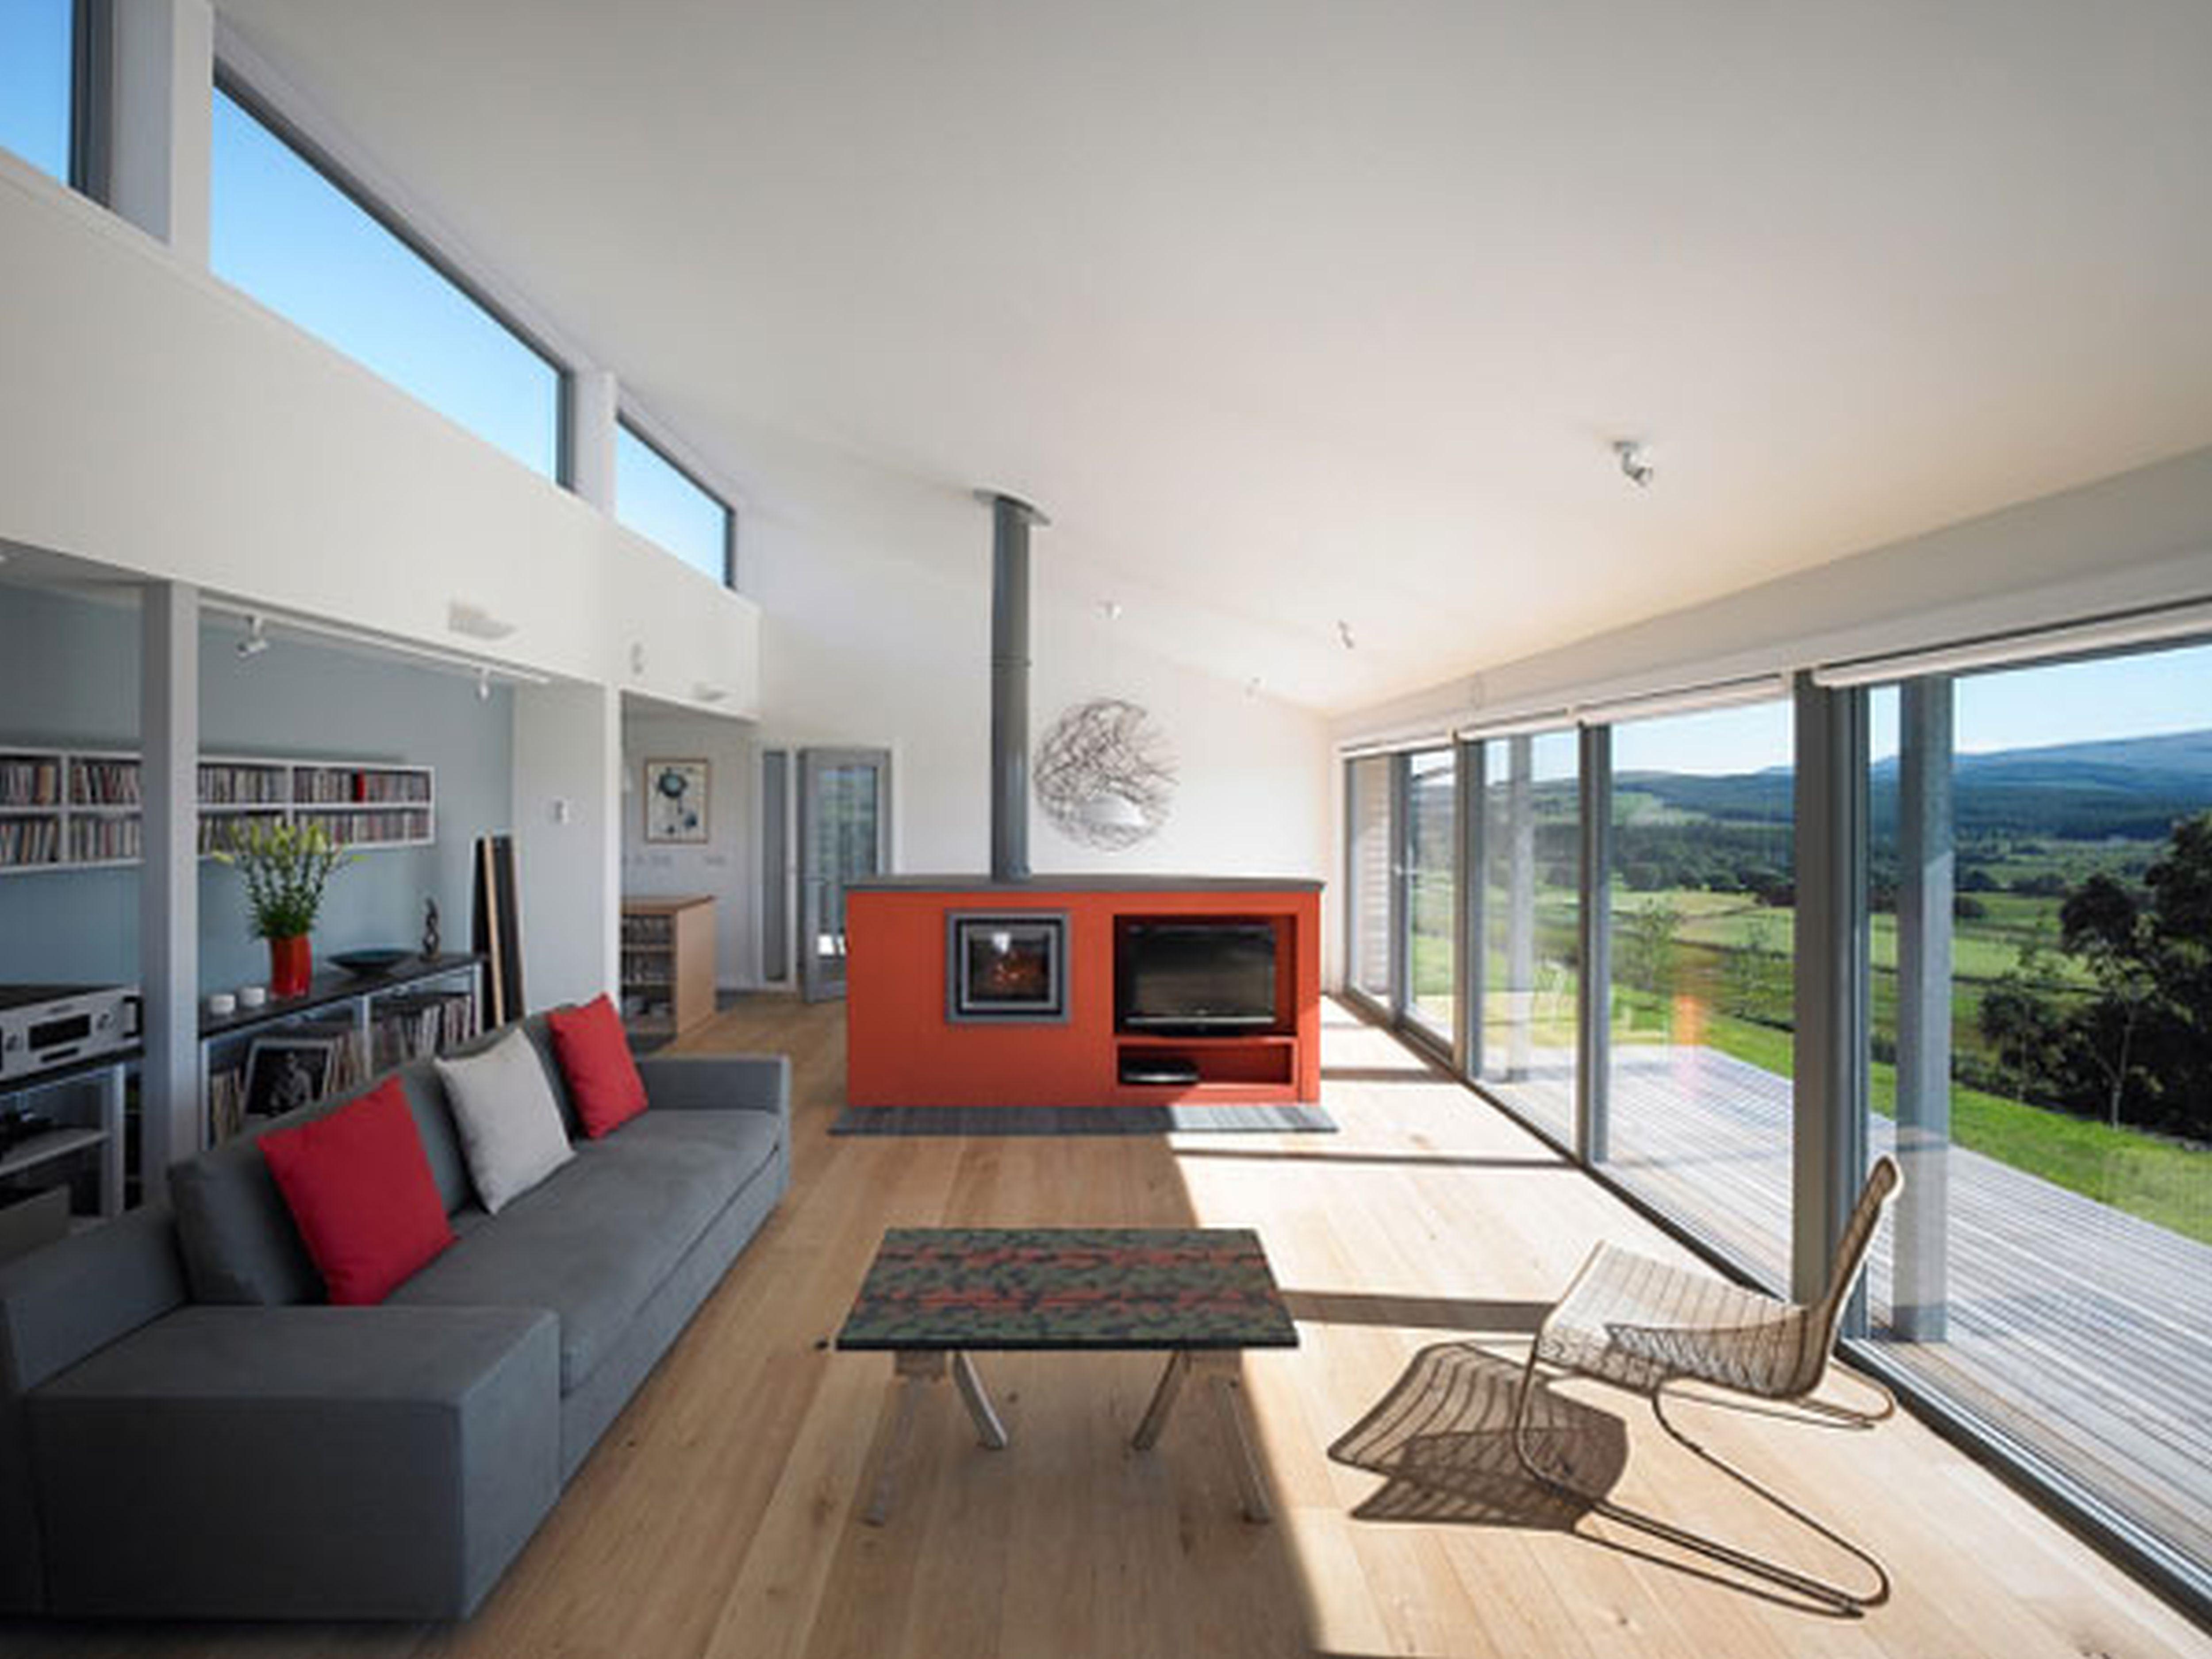 House Design Designers Home Designer Houseplans Decor Floor Plans Plan